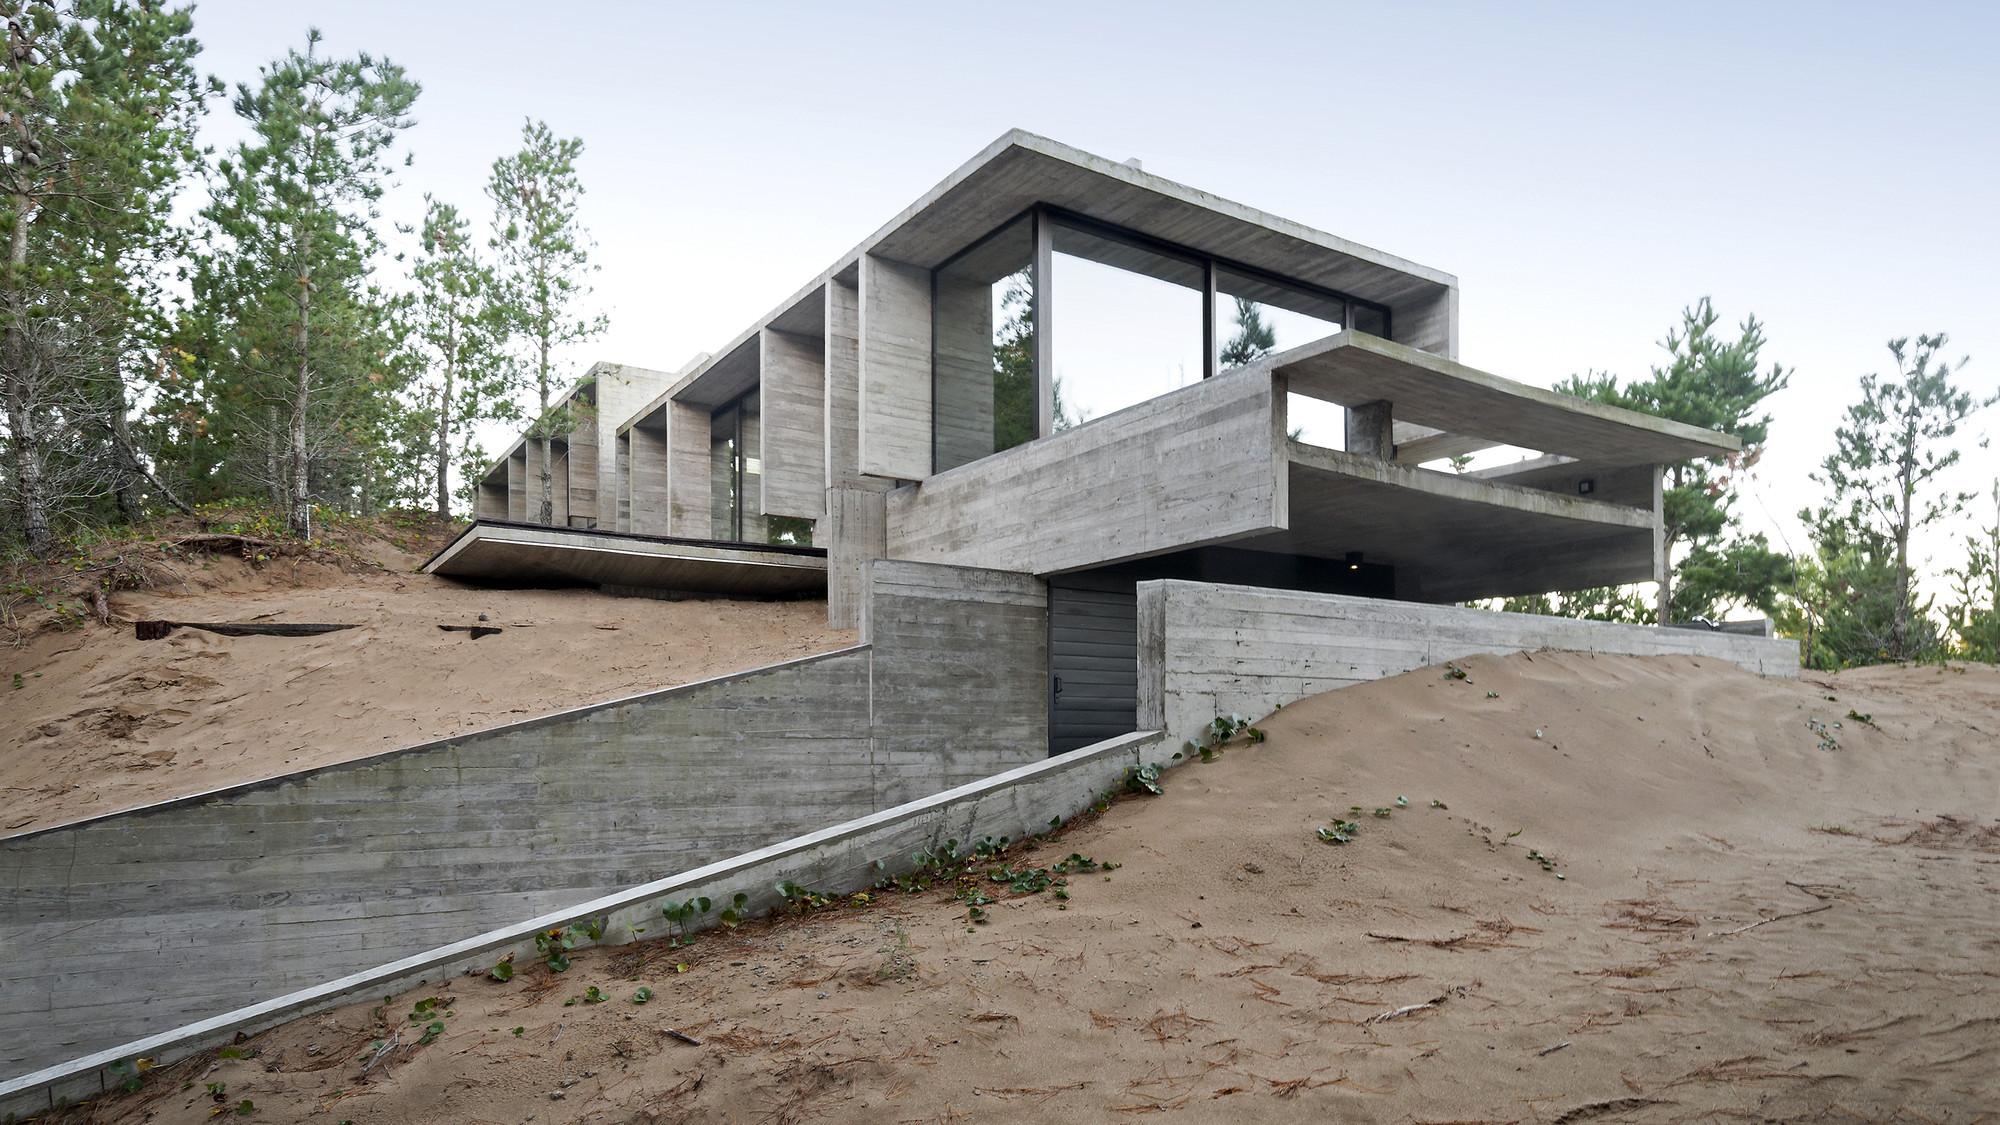 Residência Wein  / Besonias Almeida Arquitectos, © Daniela Mc Adden